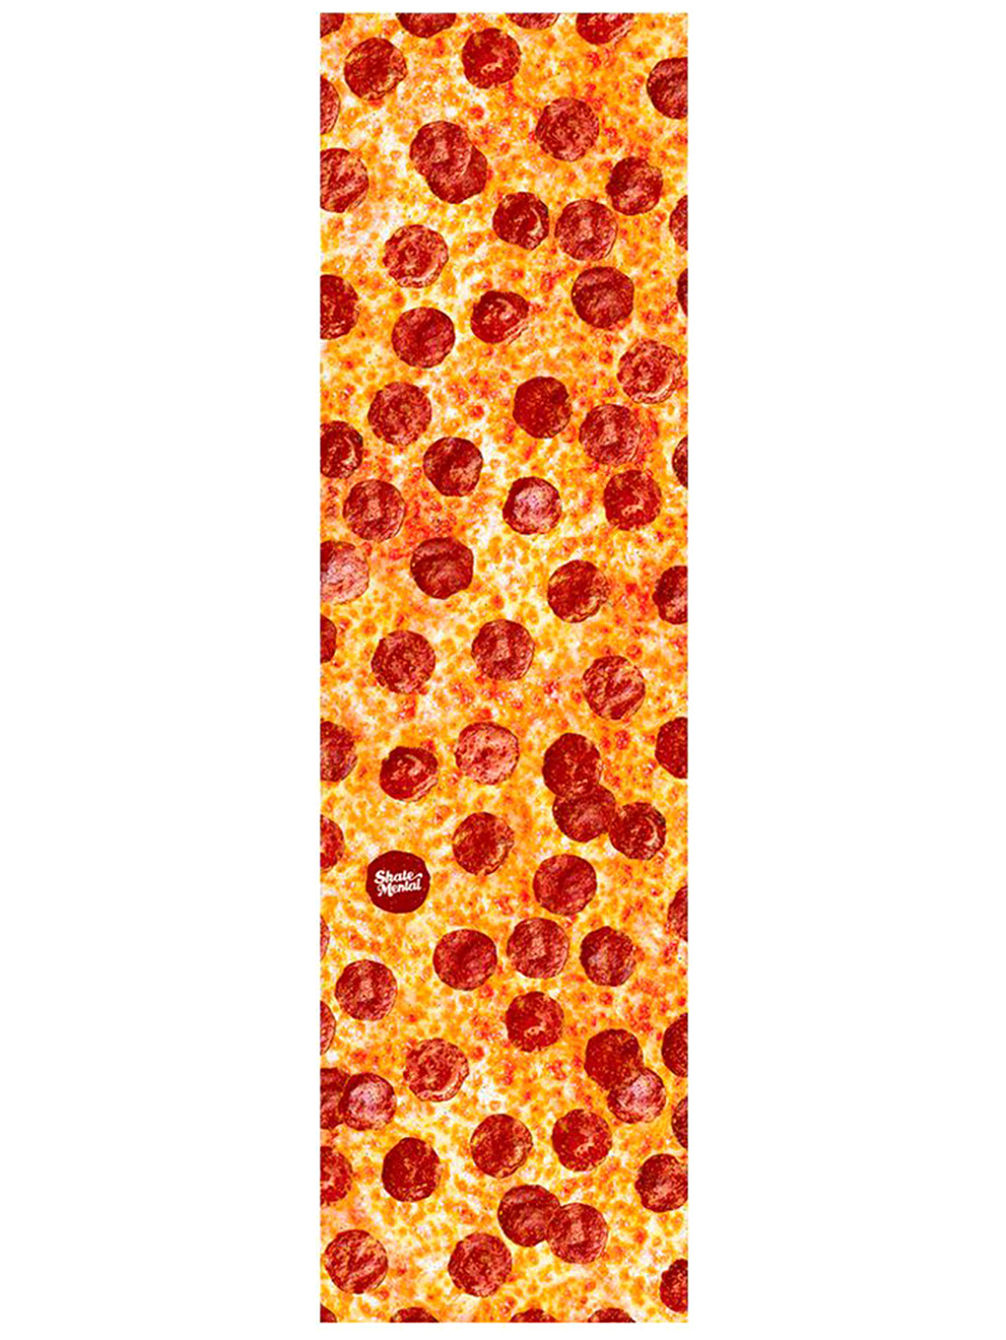 köp pizza online